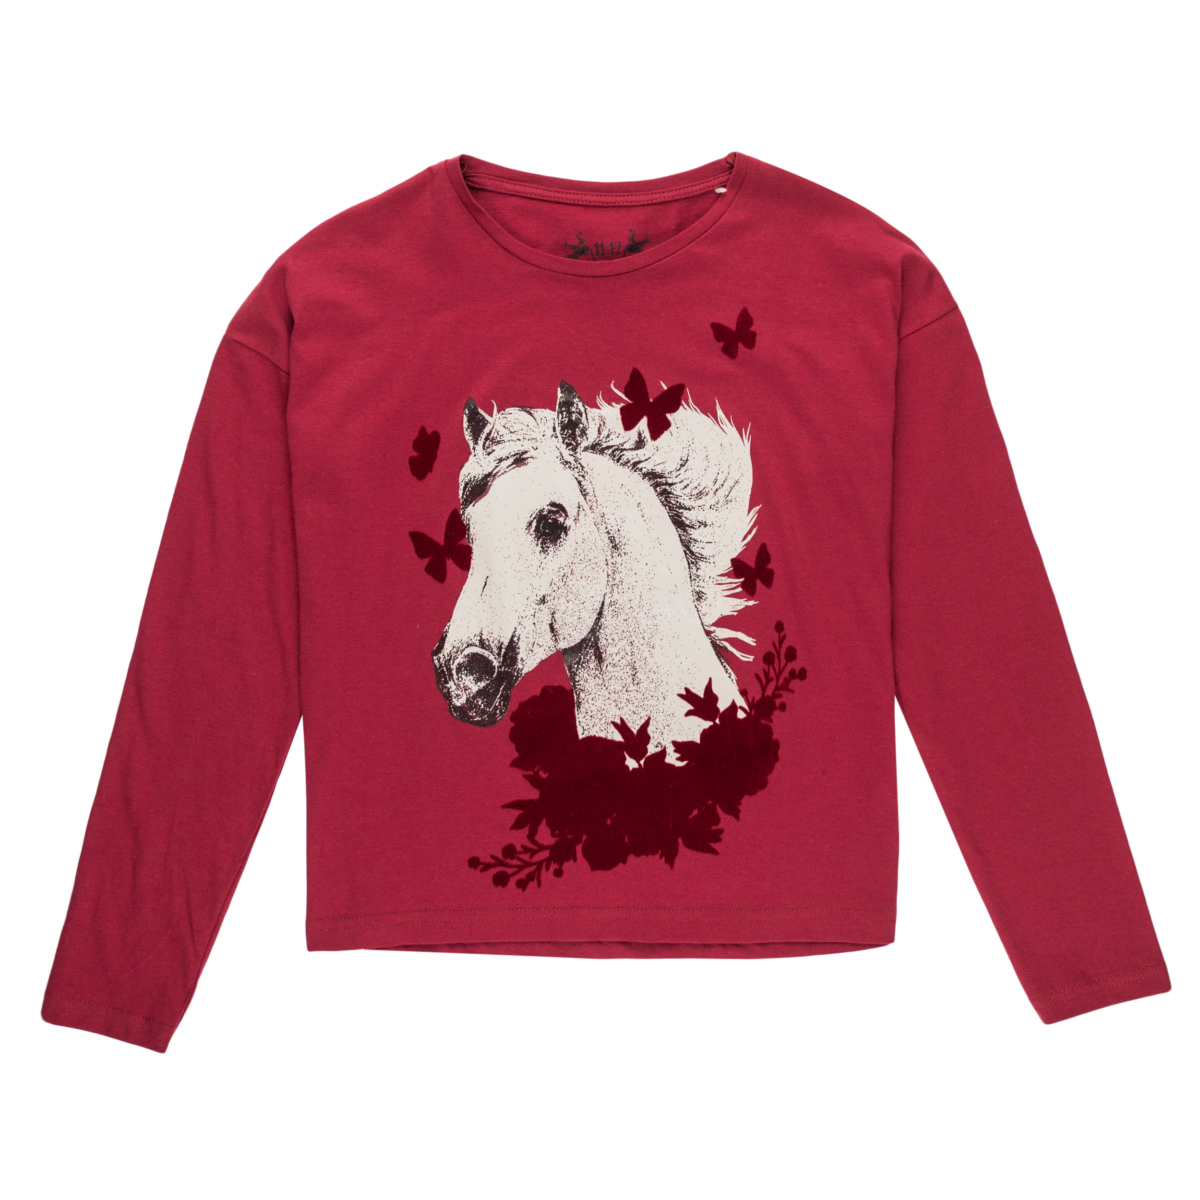 Dekliška majica, temno rdeča